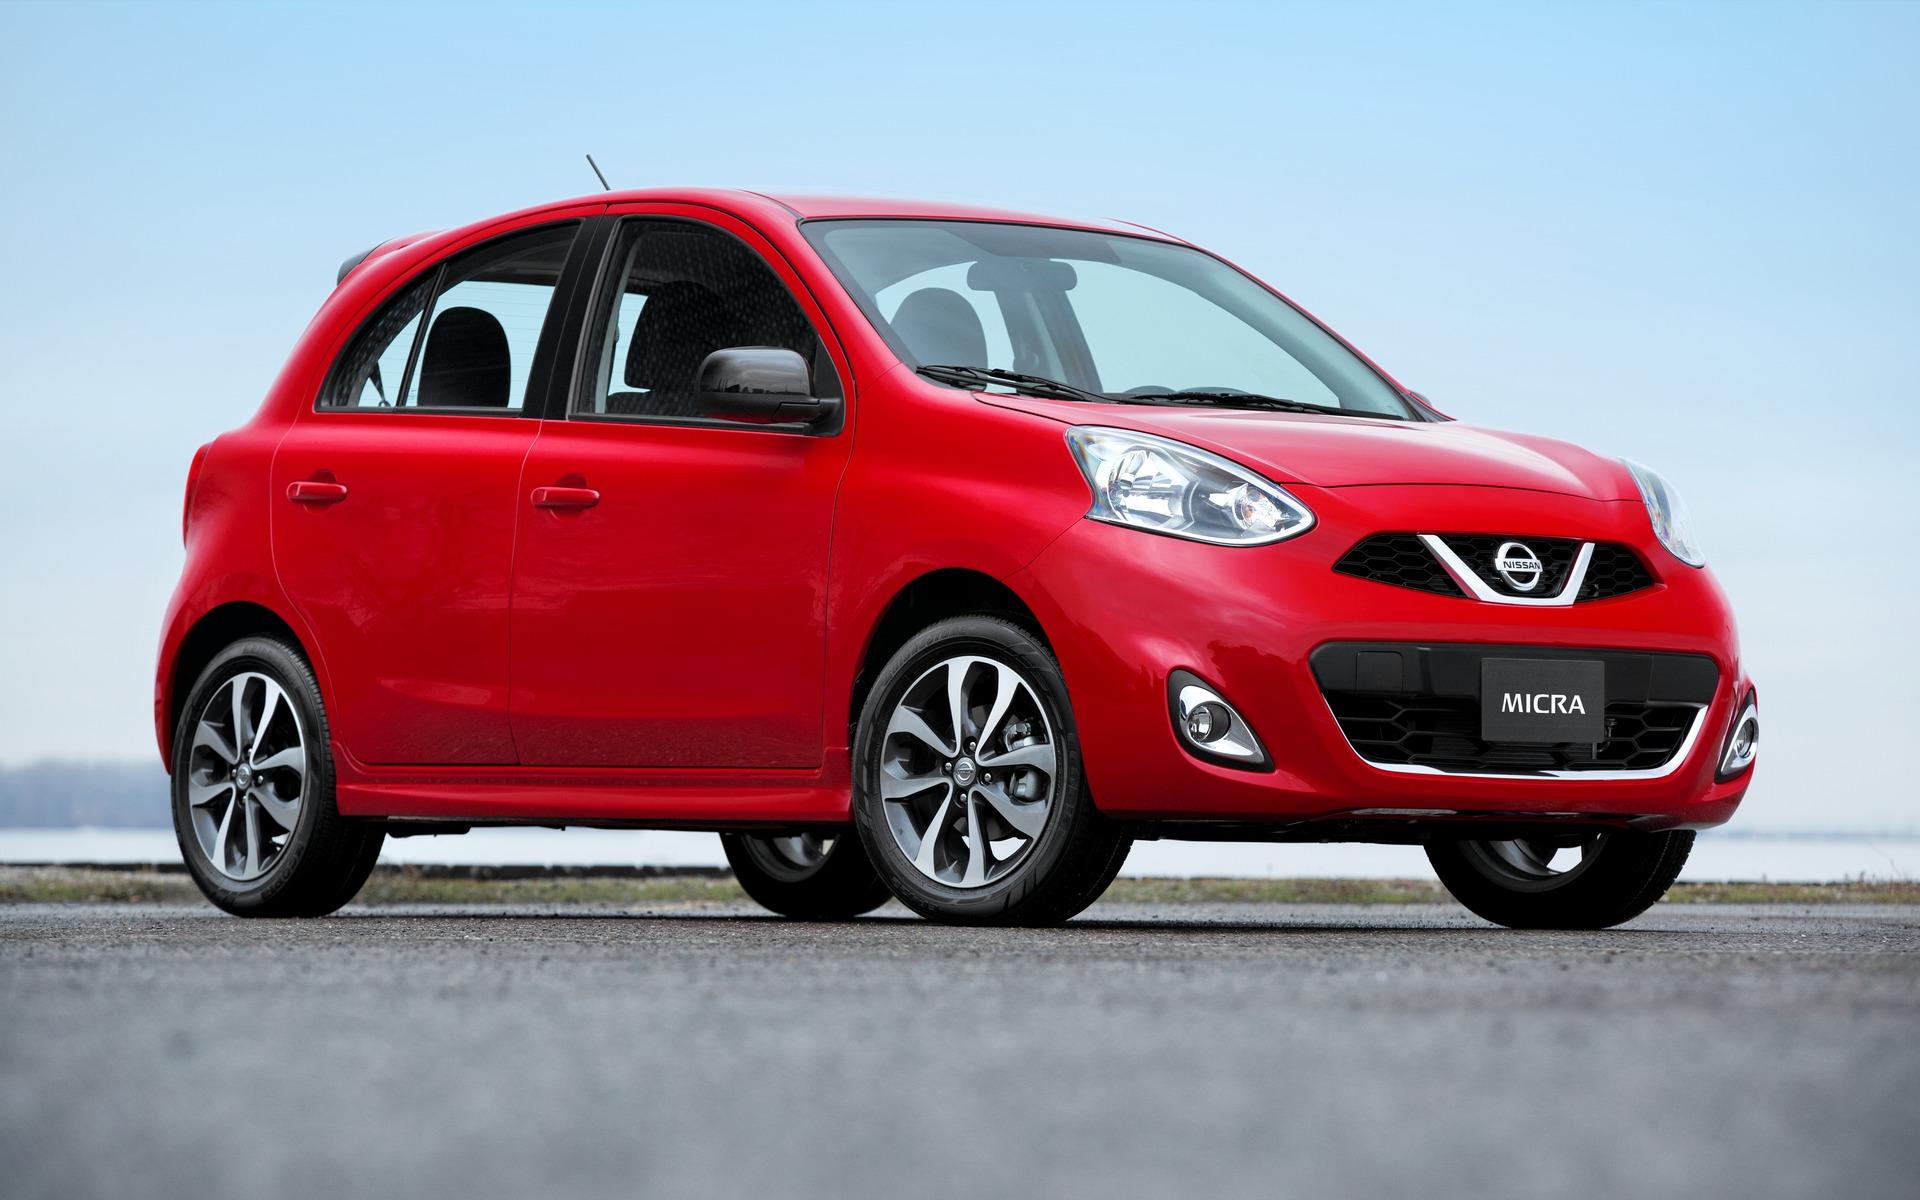 2016 Nissan Micra: $9,988 MSRP